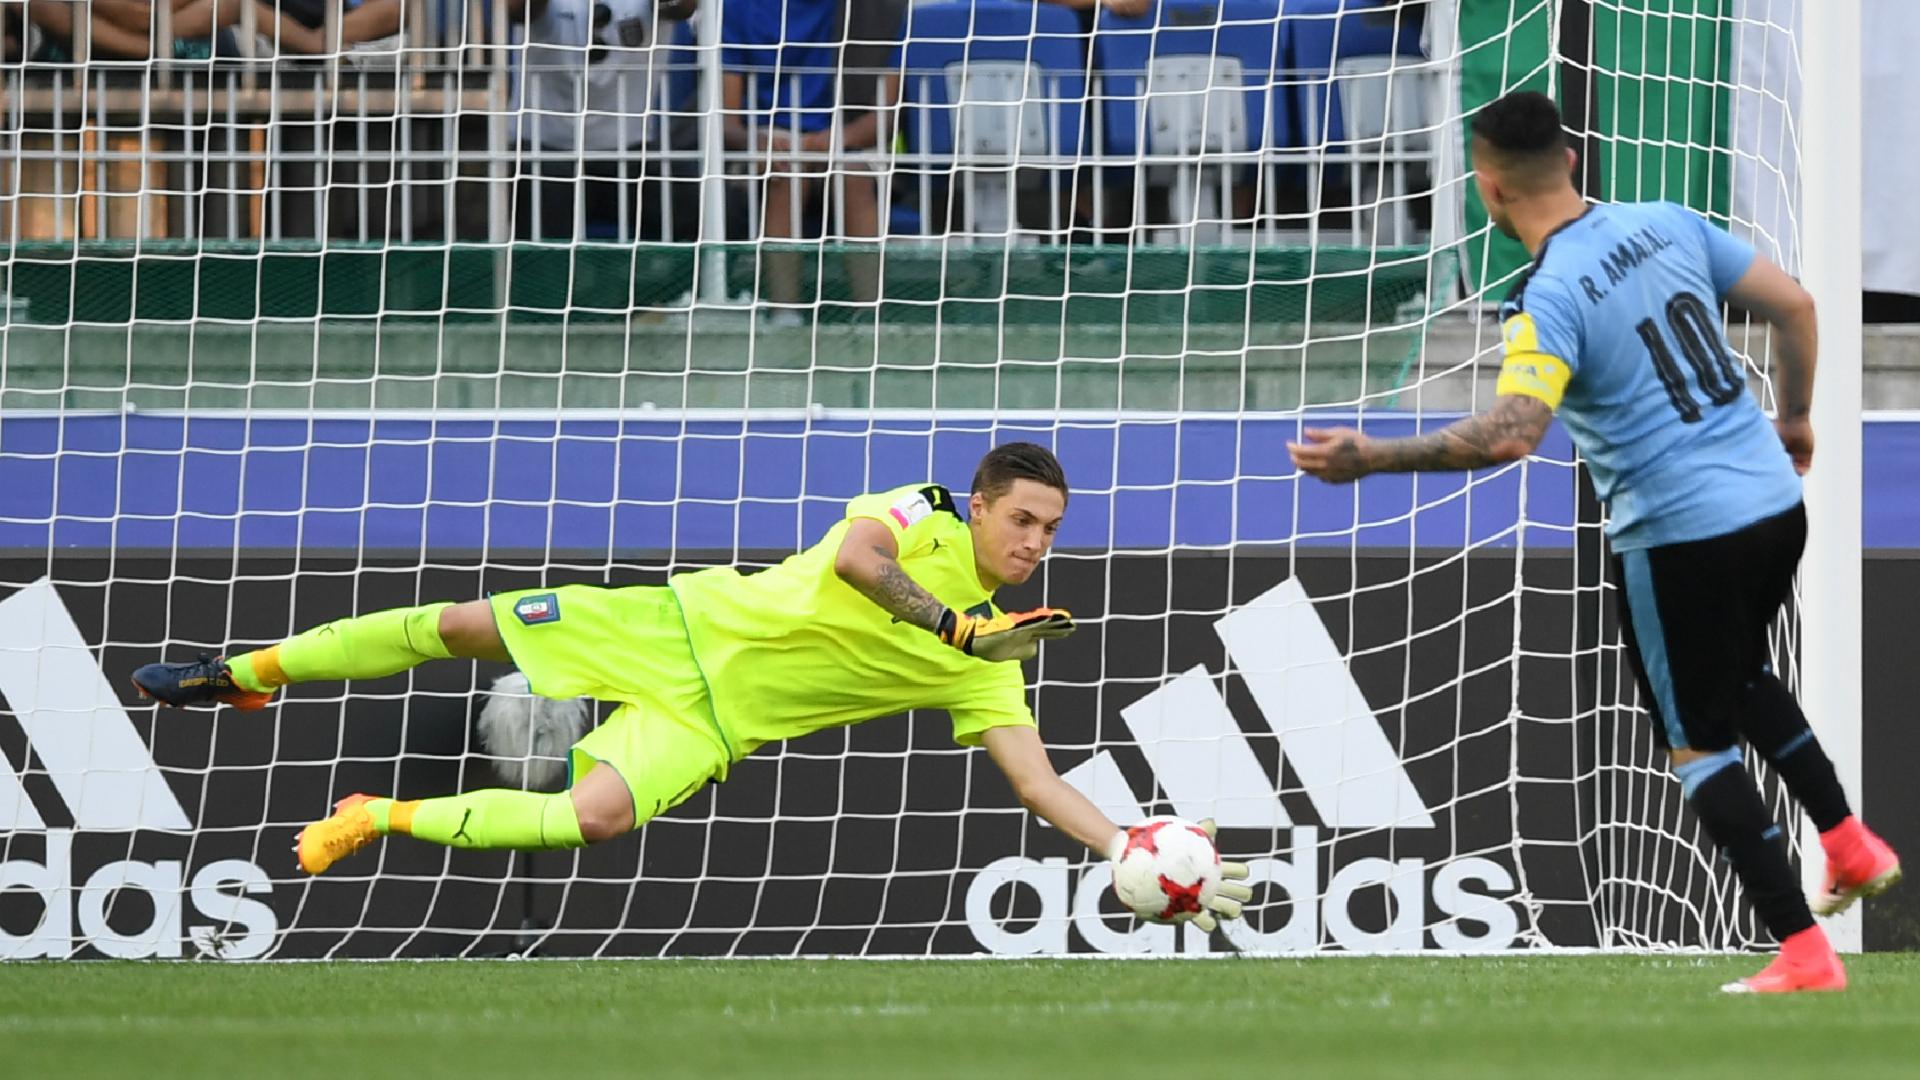 Plizzari - Uruguay-Italy U20